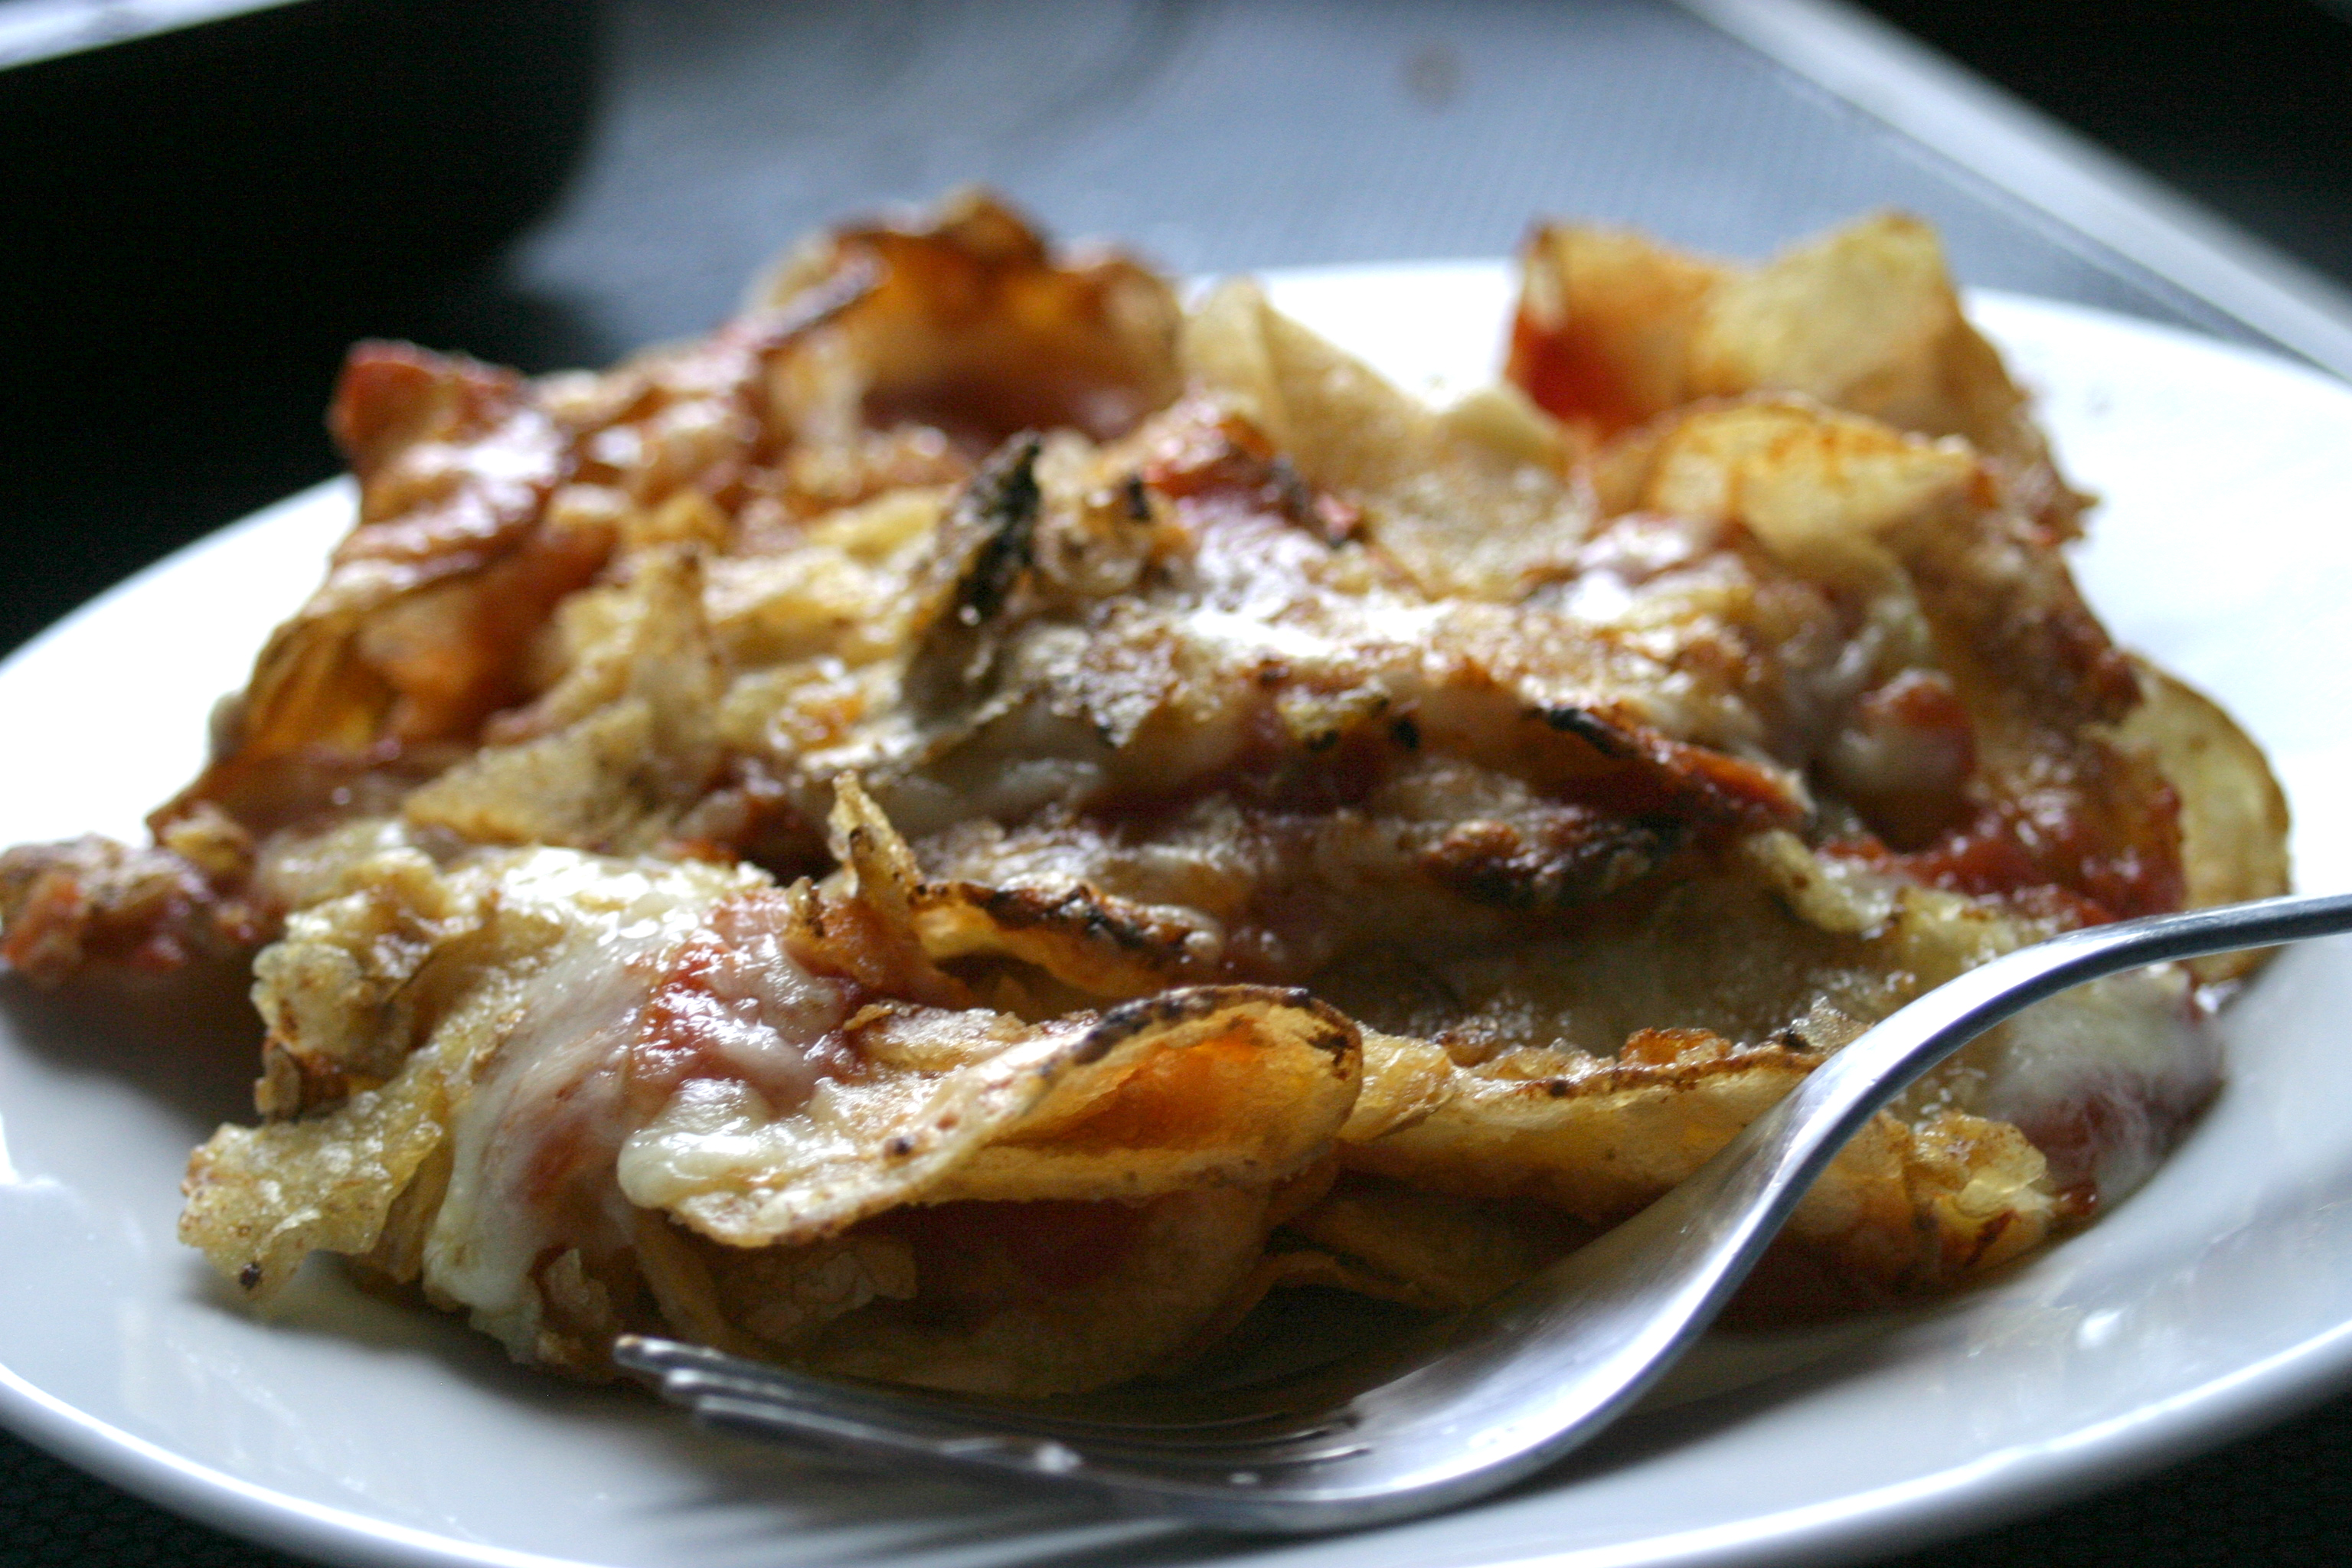 Crispy Cheese and Tomato Bake